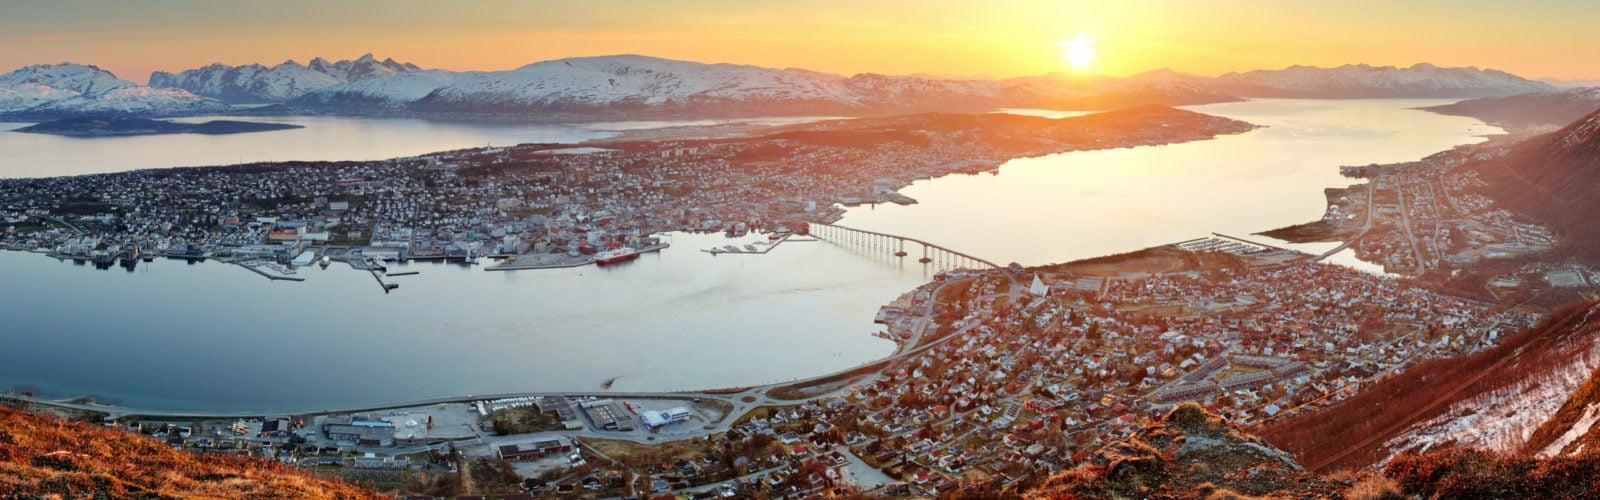 Norway city panorama - Tromso at sunset